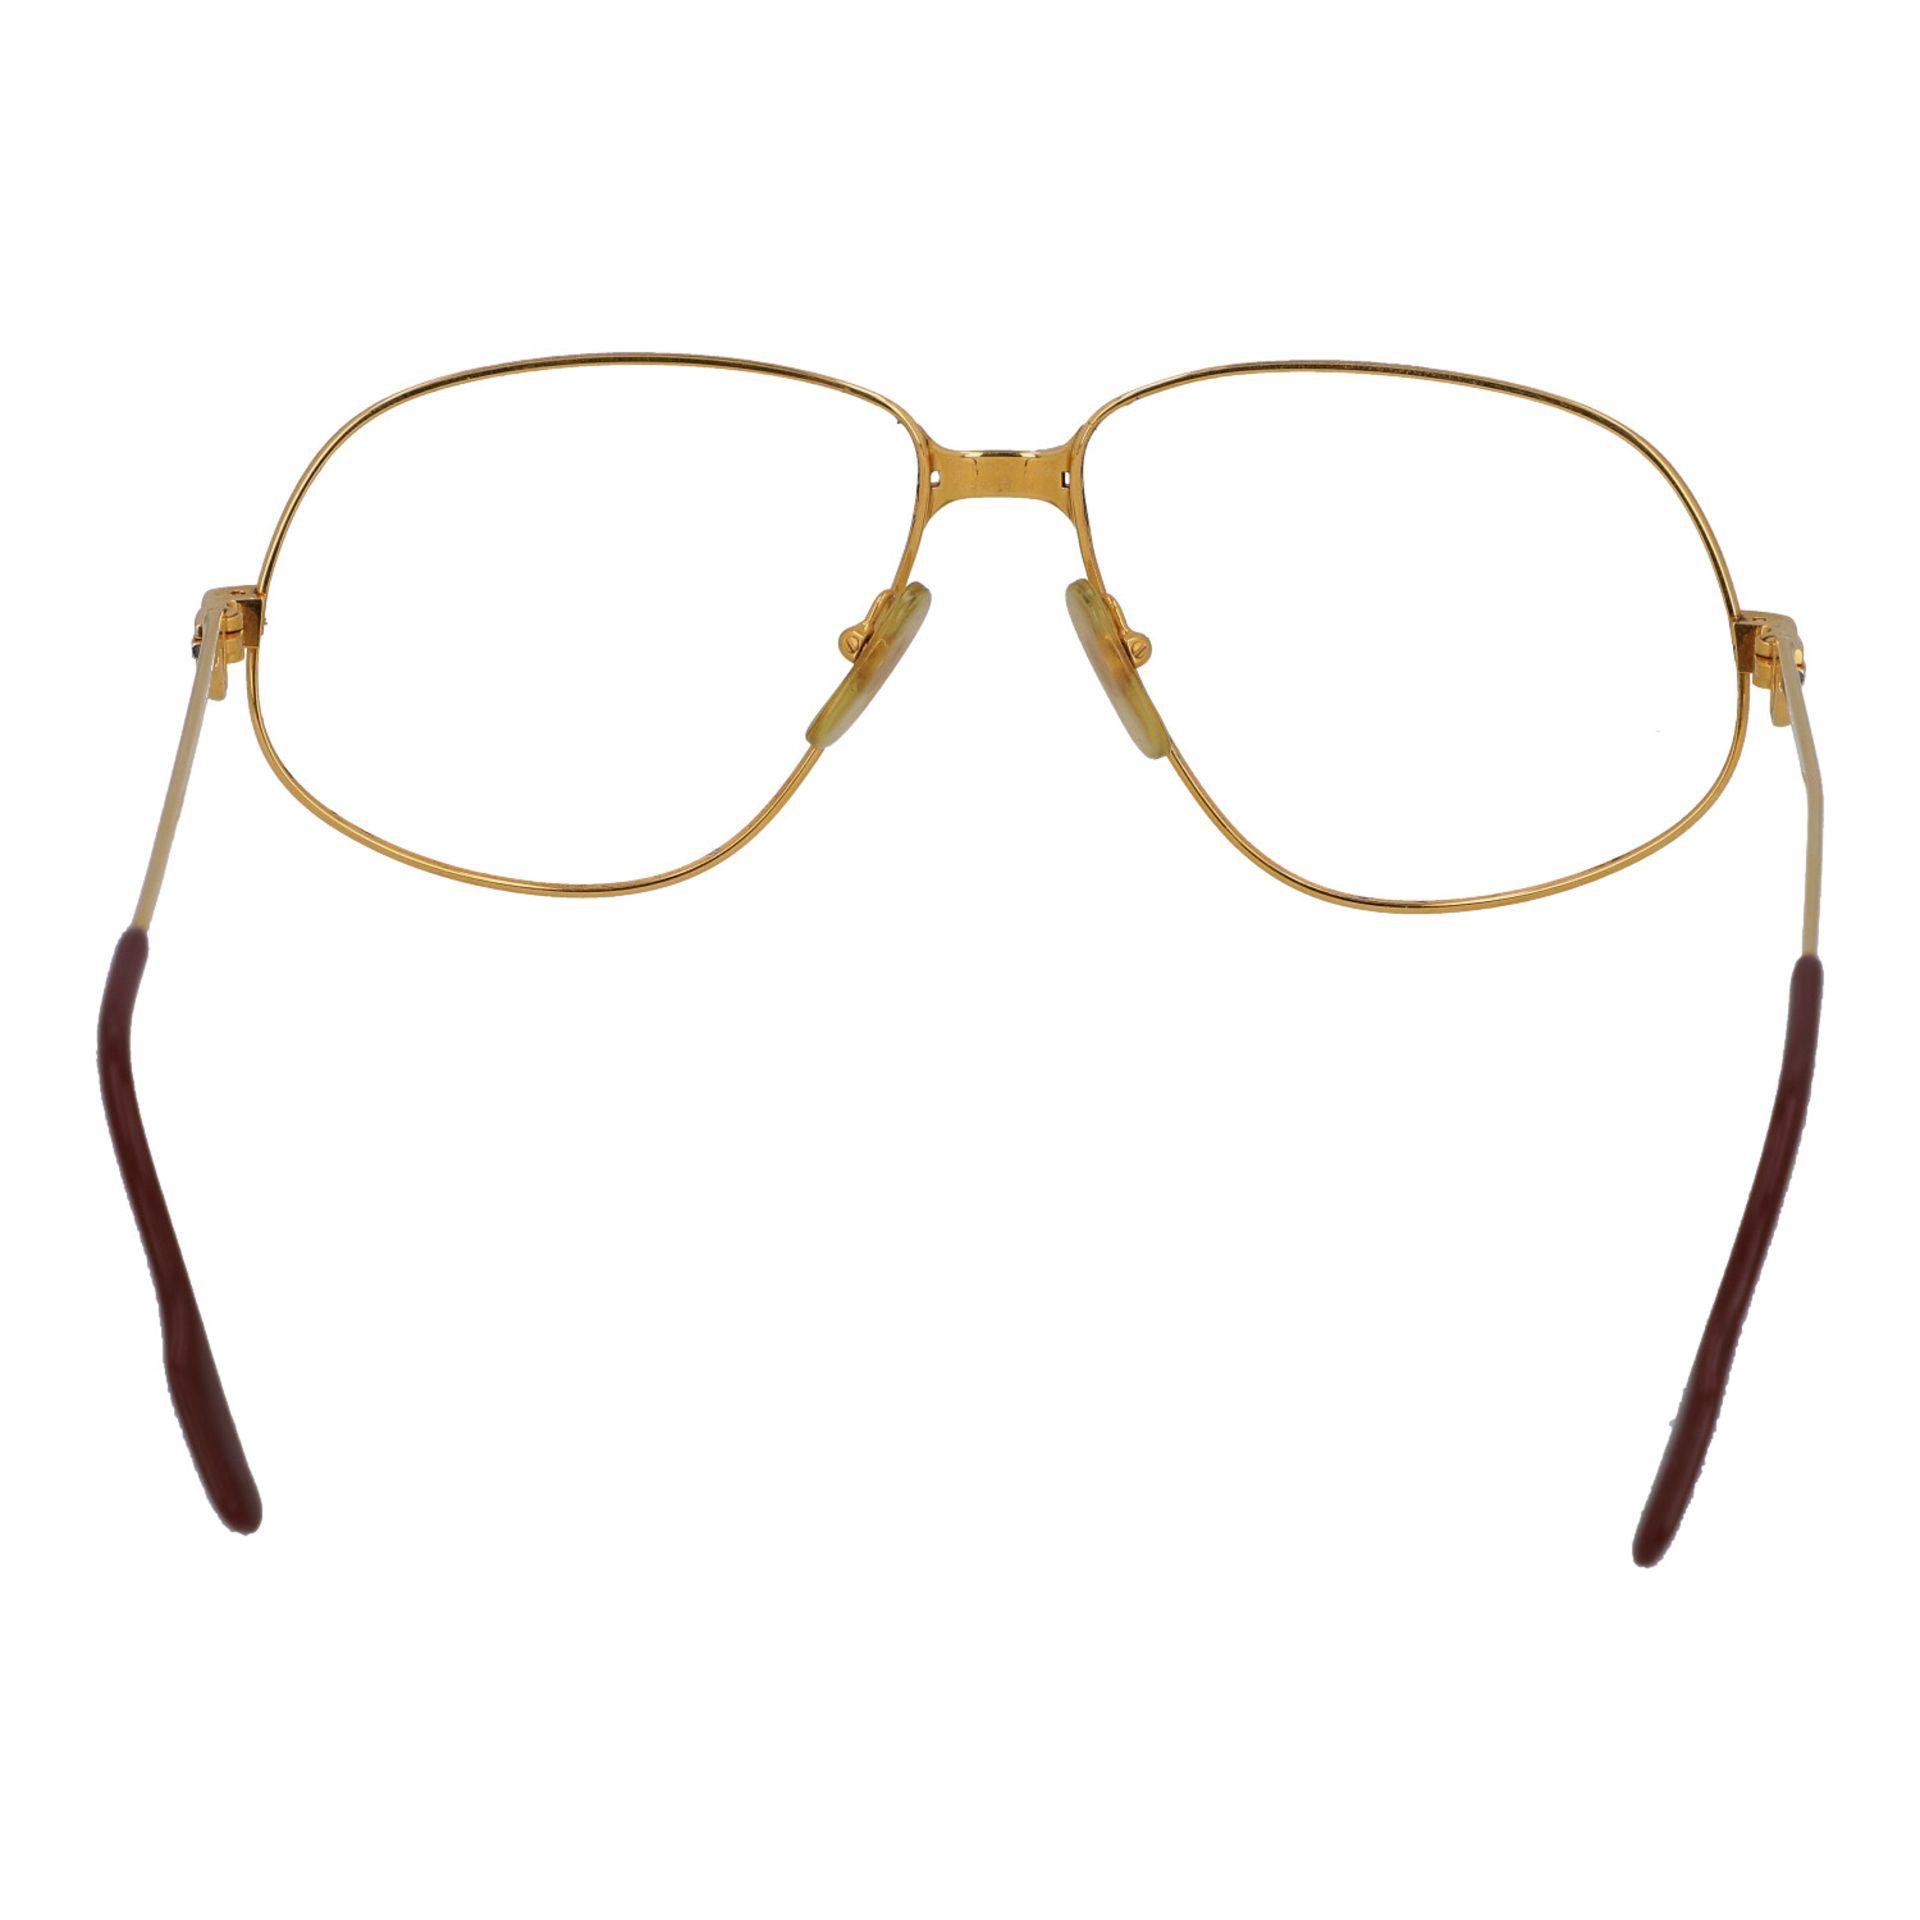 "CARTIER Brillengestell ""PANTHERE"", Koll.: 1988 in Paris. Vergoldetes Modell ohne Gläs - Image 4 of 4"